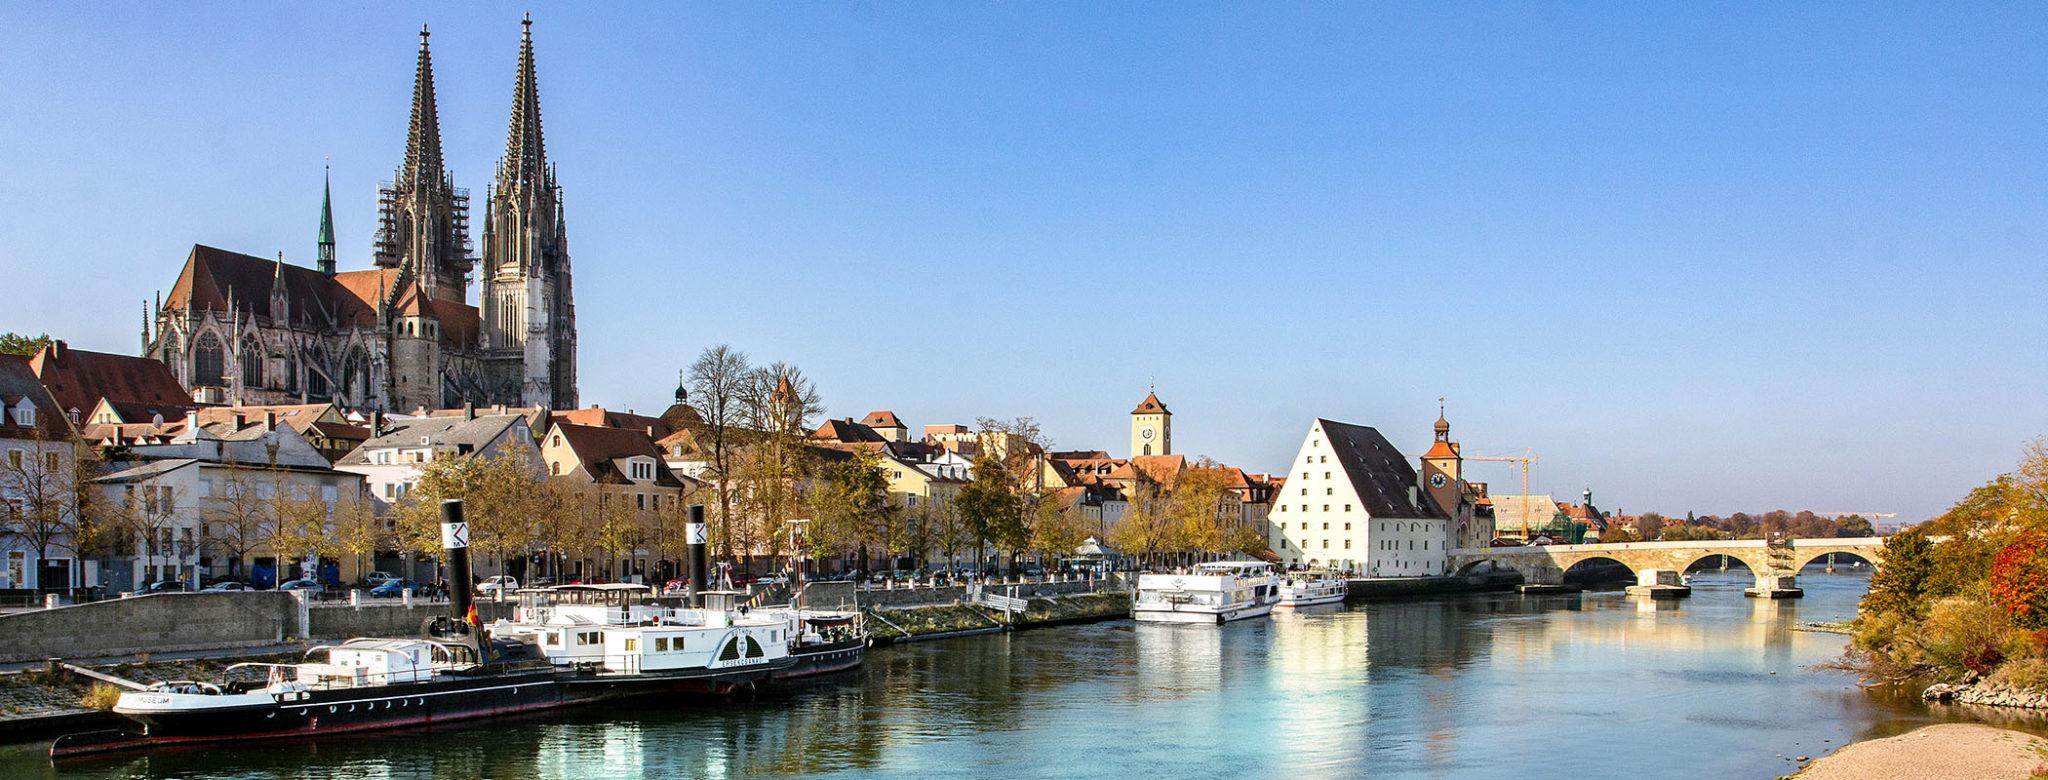 BAYERN: Regensburg – 25 historische Highlights